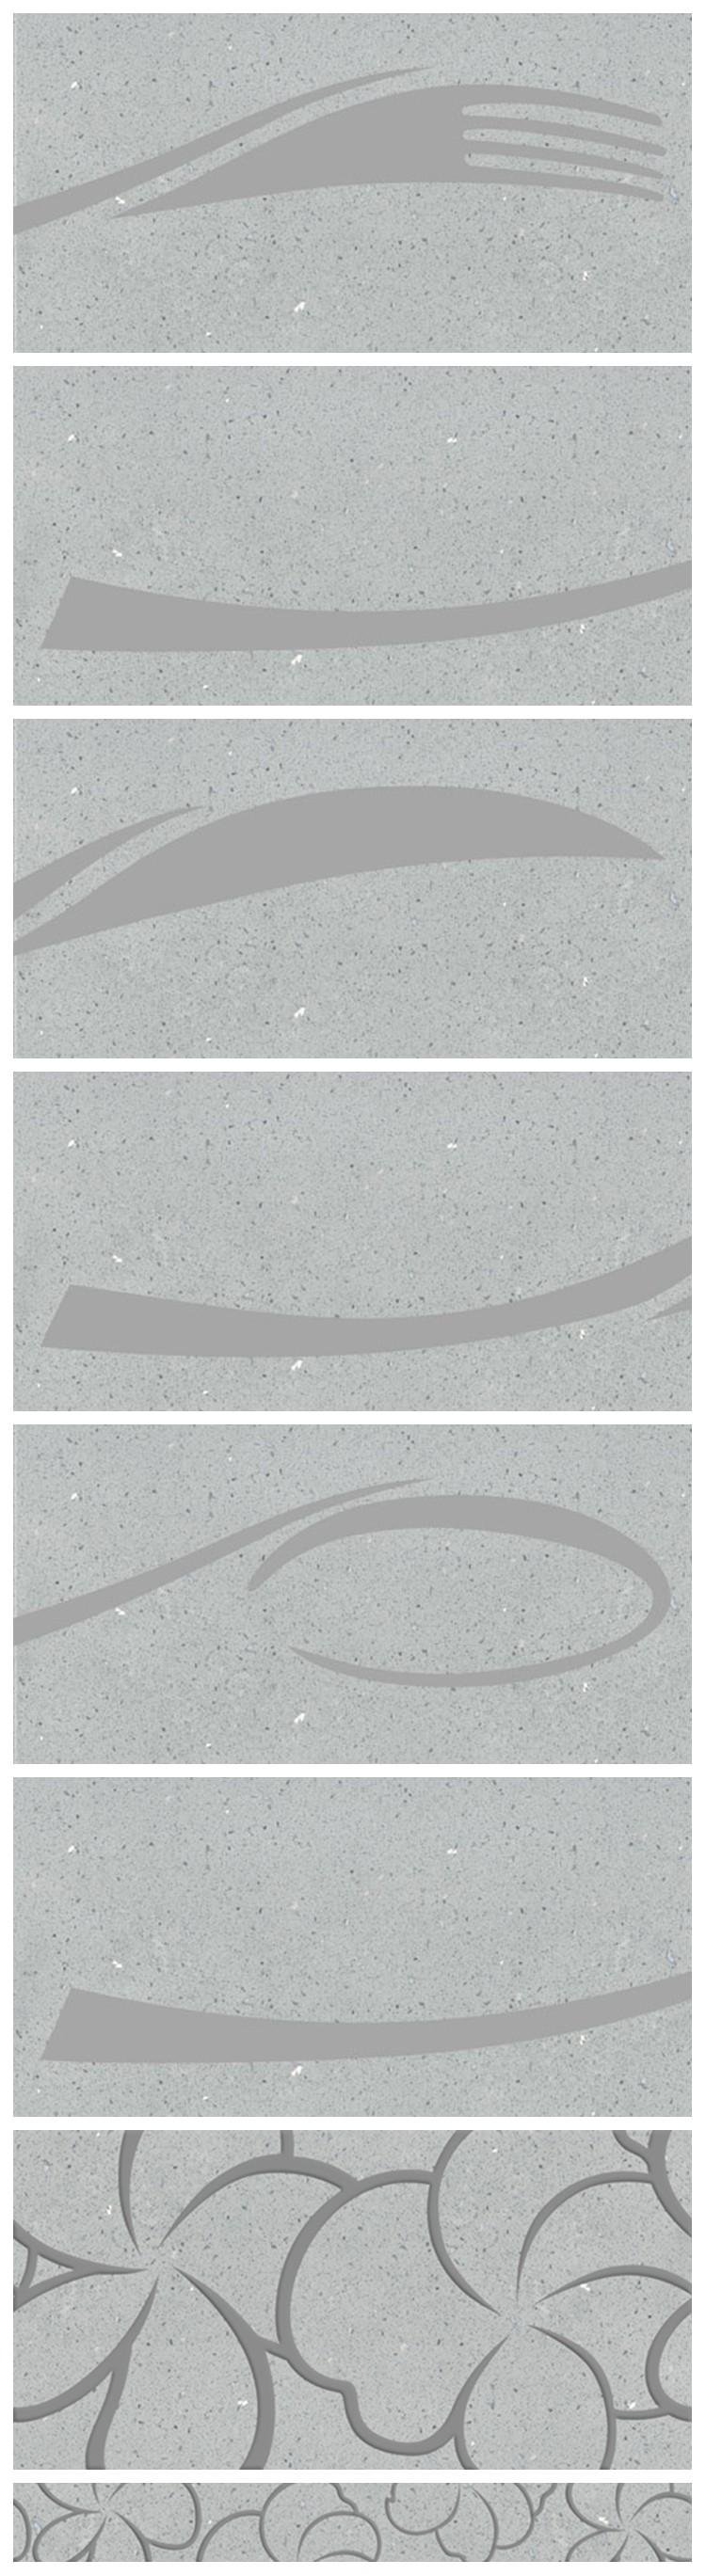 High quality wear resistant 3d laminate flooring buy 3d for 3d laminate flooring